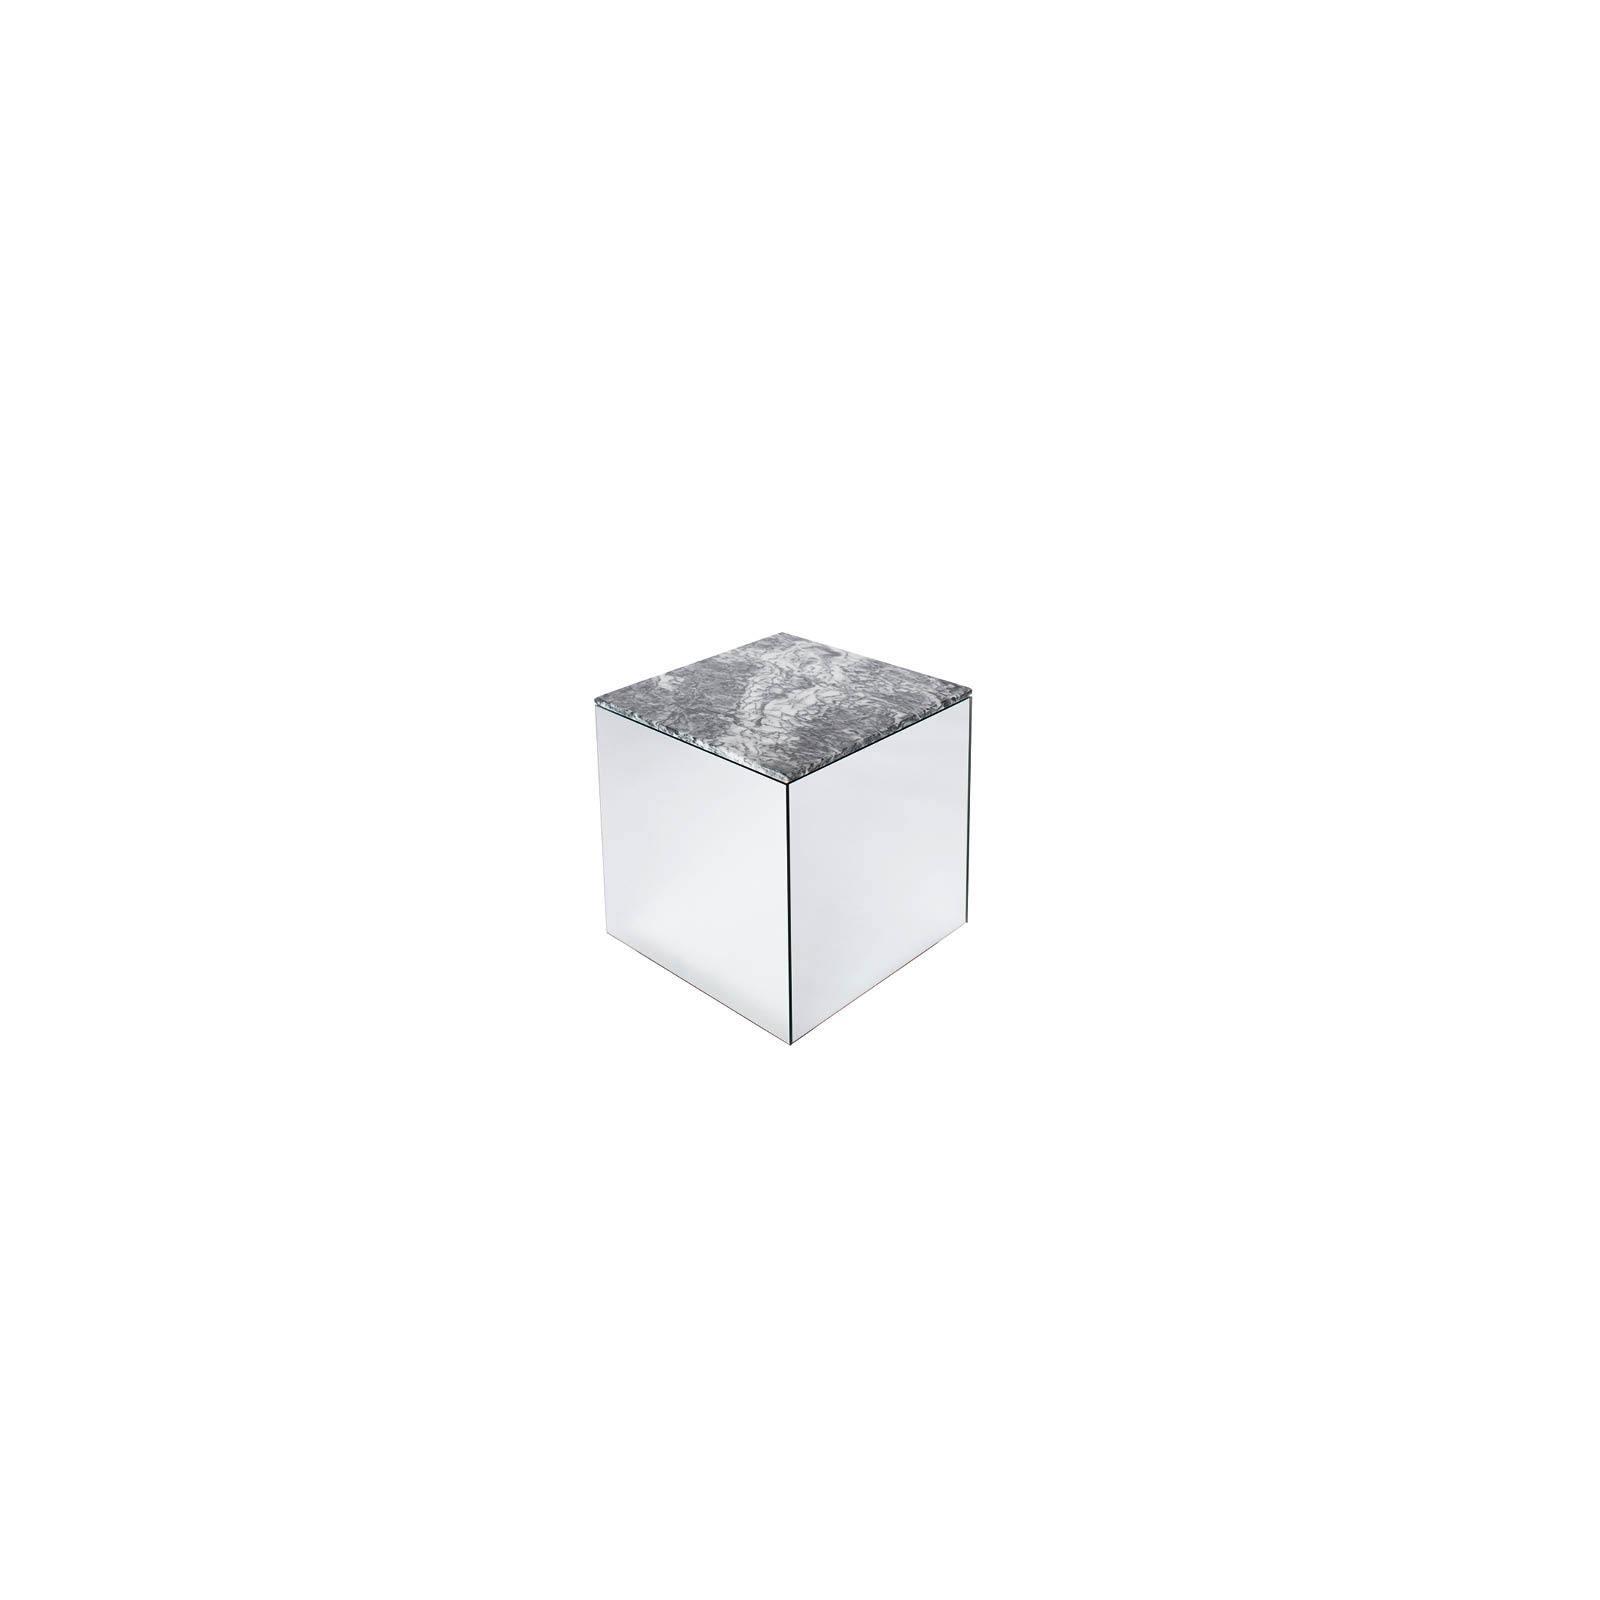 petite table basse miroir arne concept. Black Bedroom Furniture Sets. Home Design Ideas